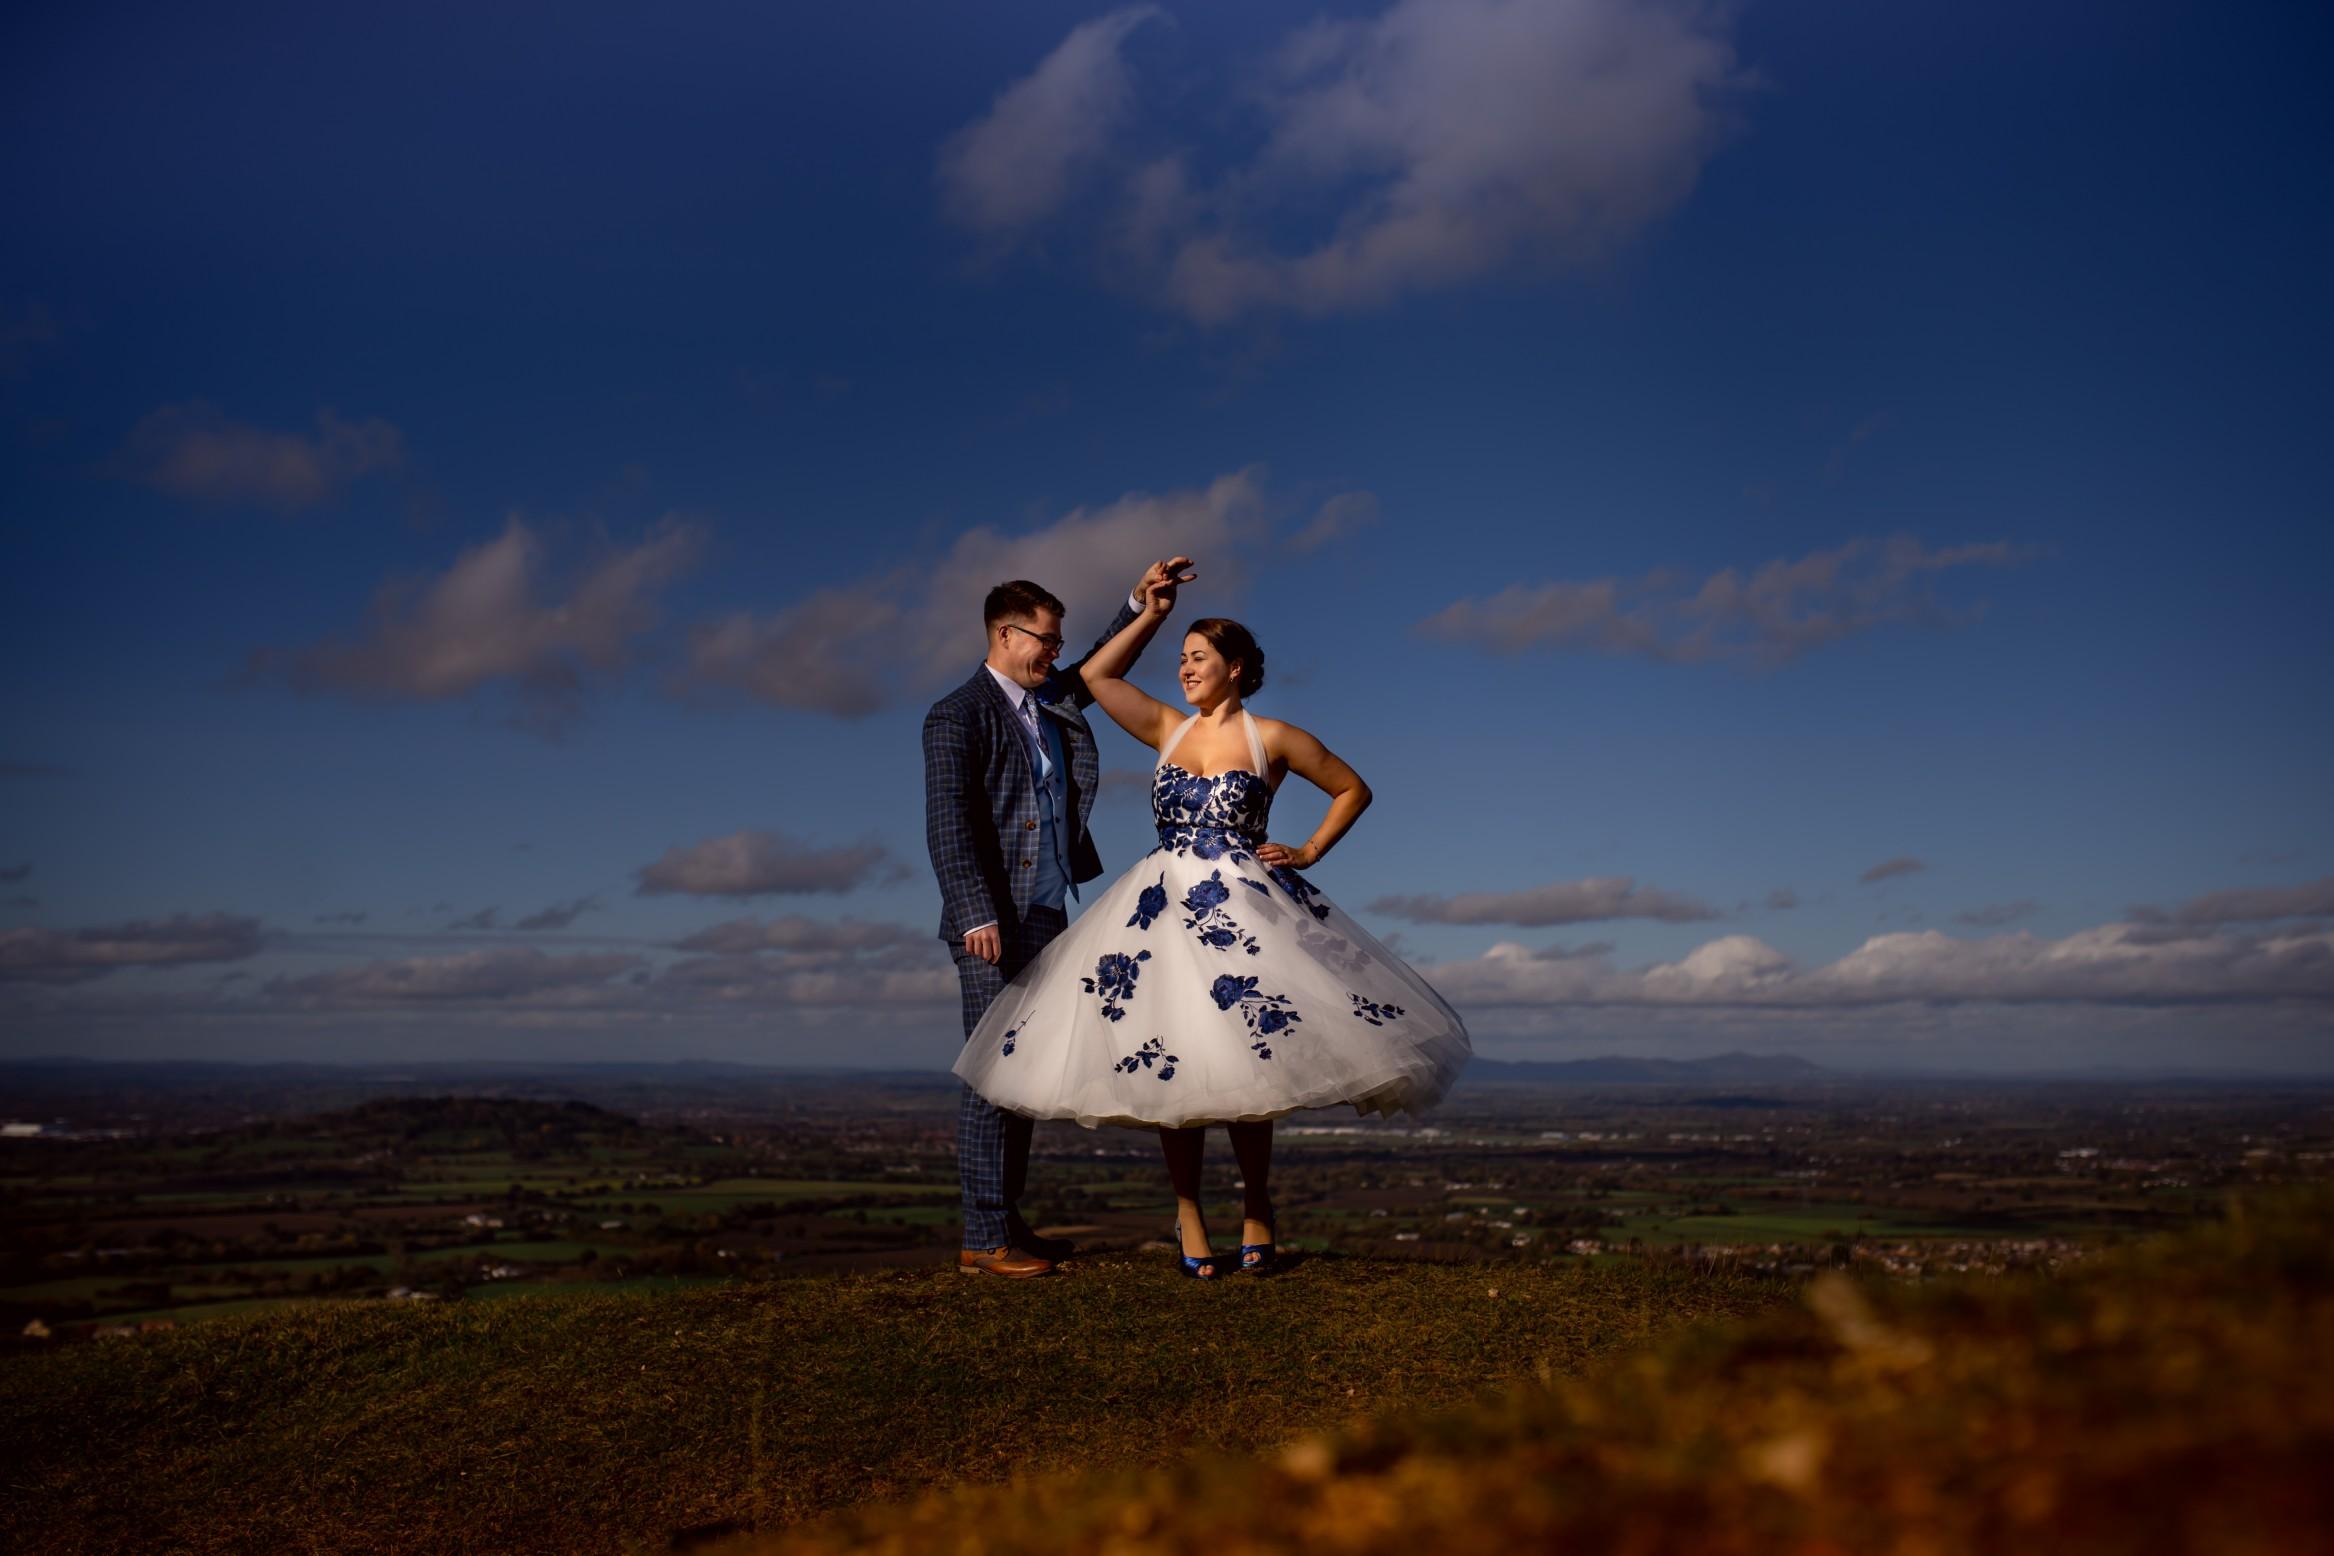 bride and groom dancing - alternative wedding photography - creative wedding photography - artistic wedding photography - vintage wedding dress